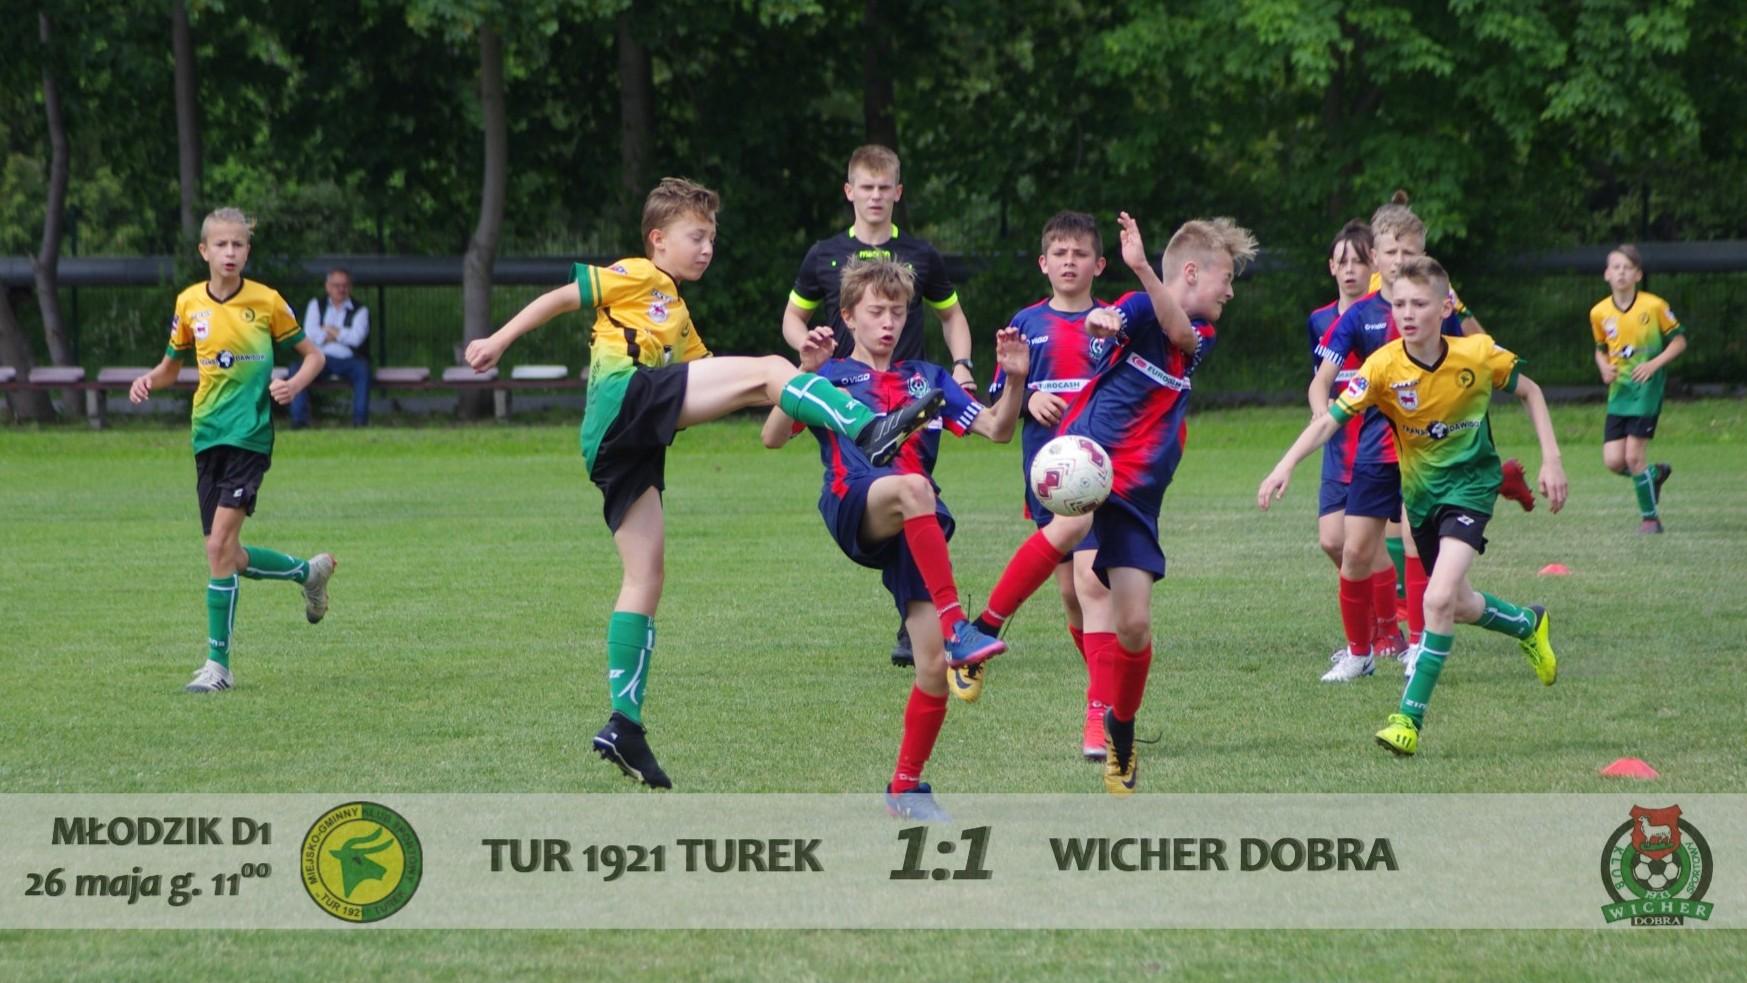 Tur 1921 Turek- Wicher Dobra 1:1 fotorelacja